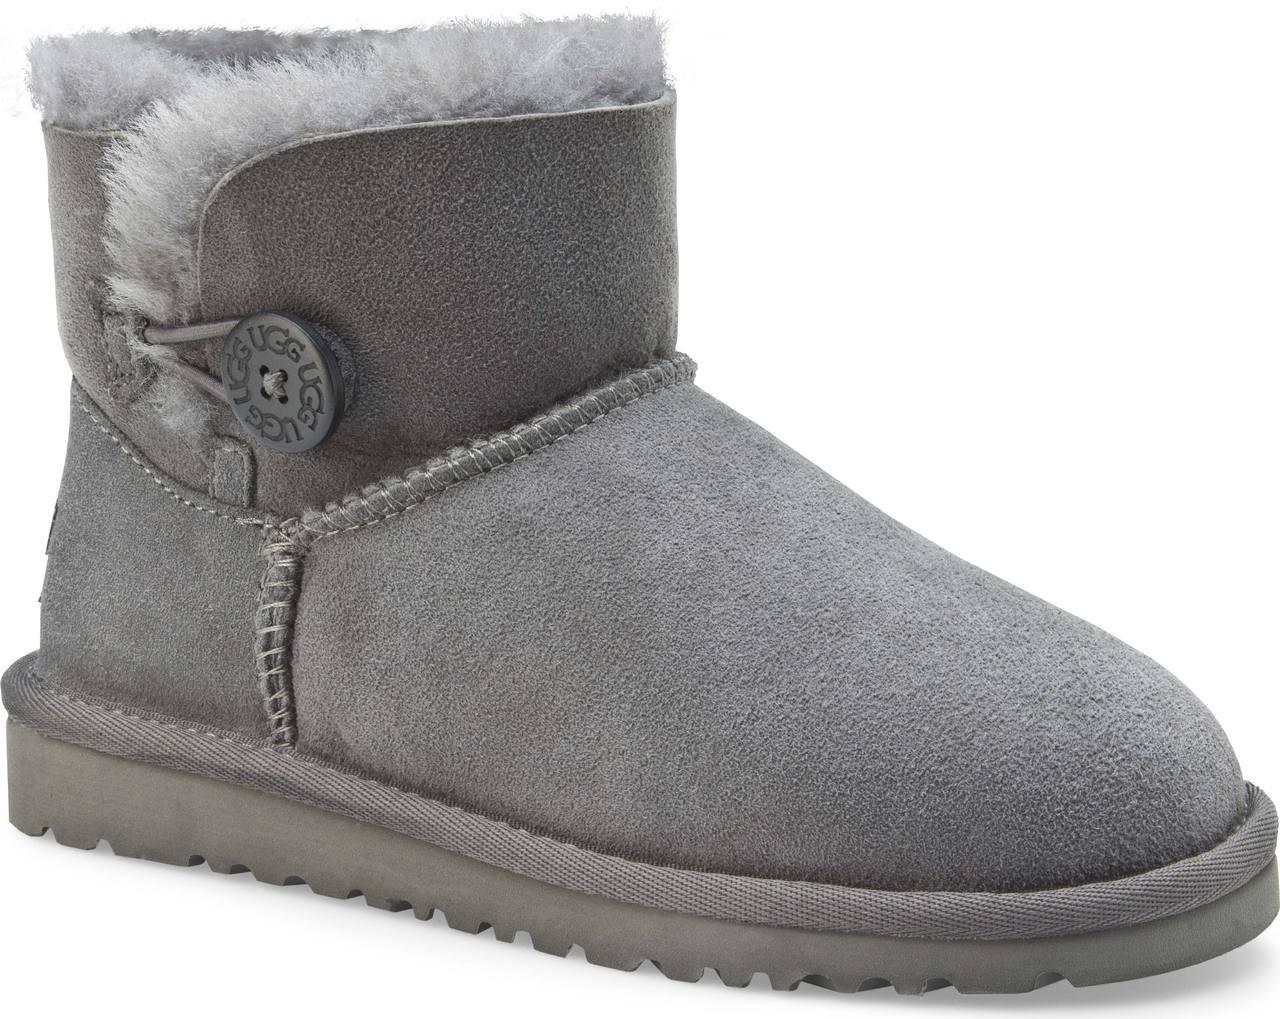 clearance ugg mini bailey button bling womens boots jobs 4ad9c 3ae08 rh alannacaldas com